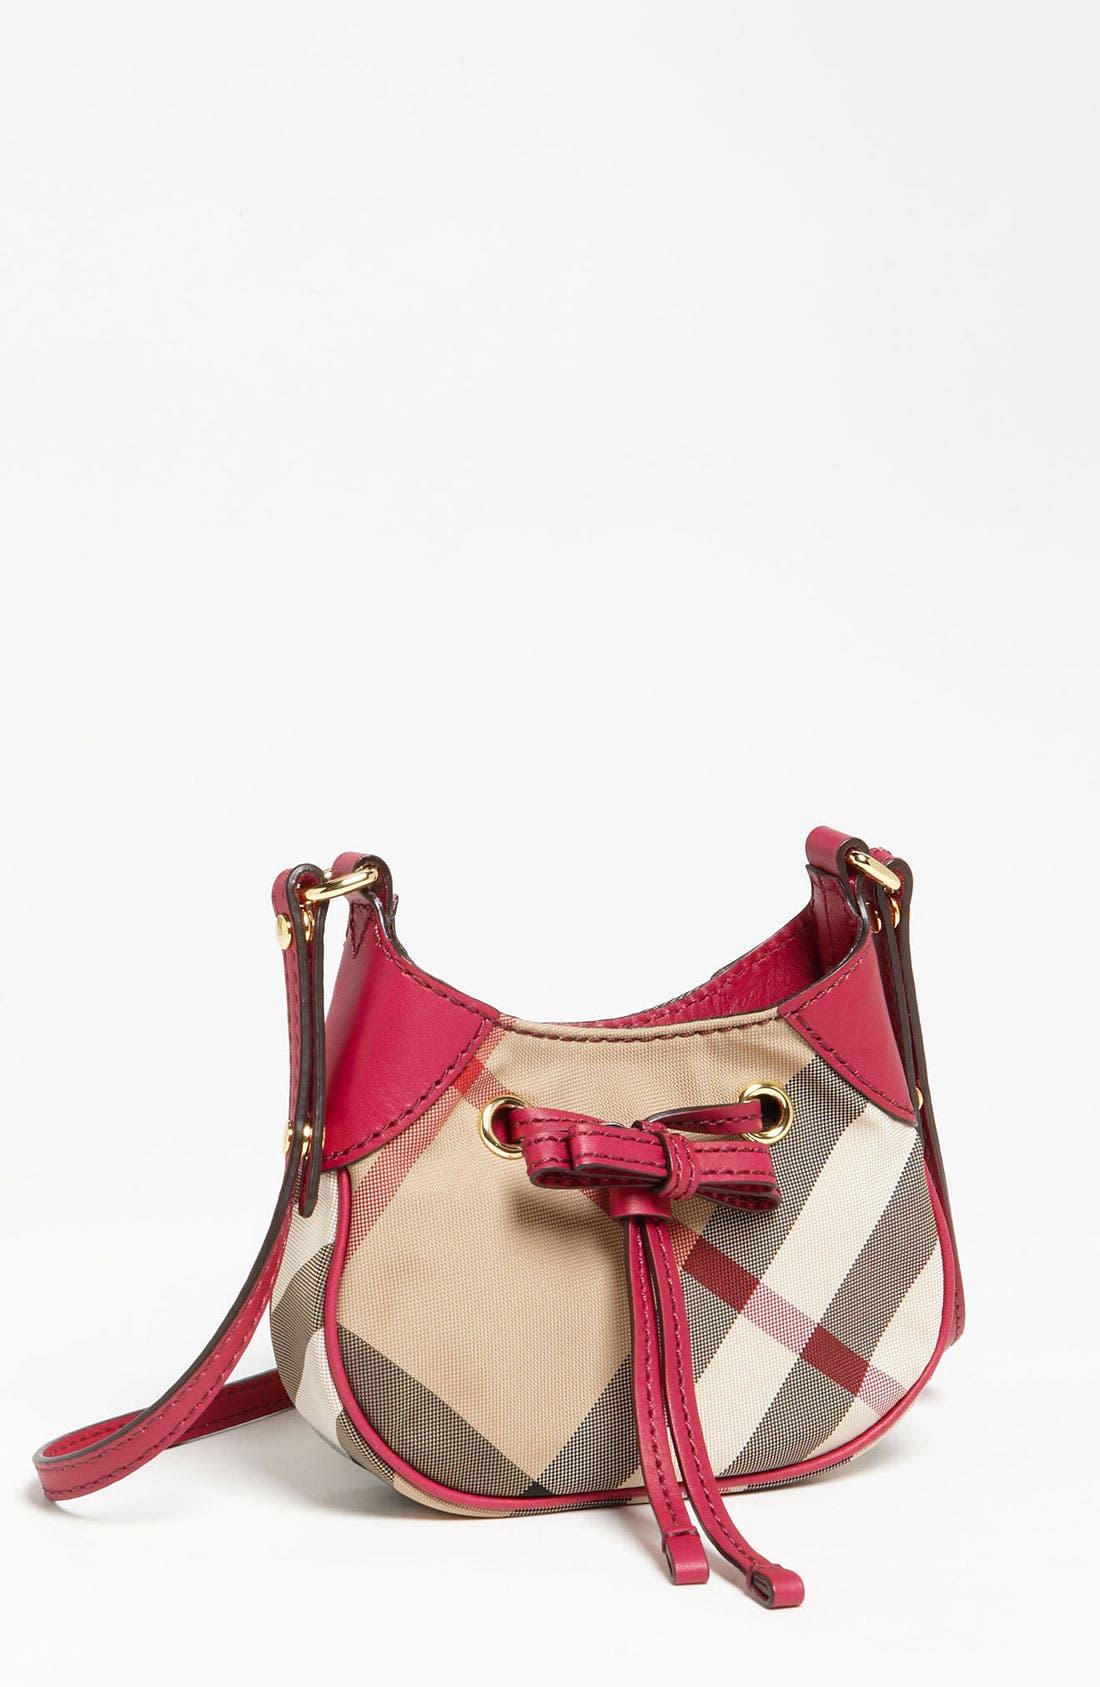 Main Image - Burberry 'Ruby' Mini Shoulder Bag (Girls)